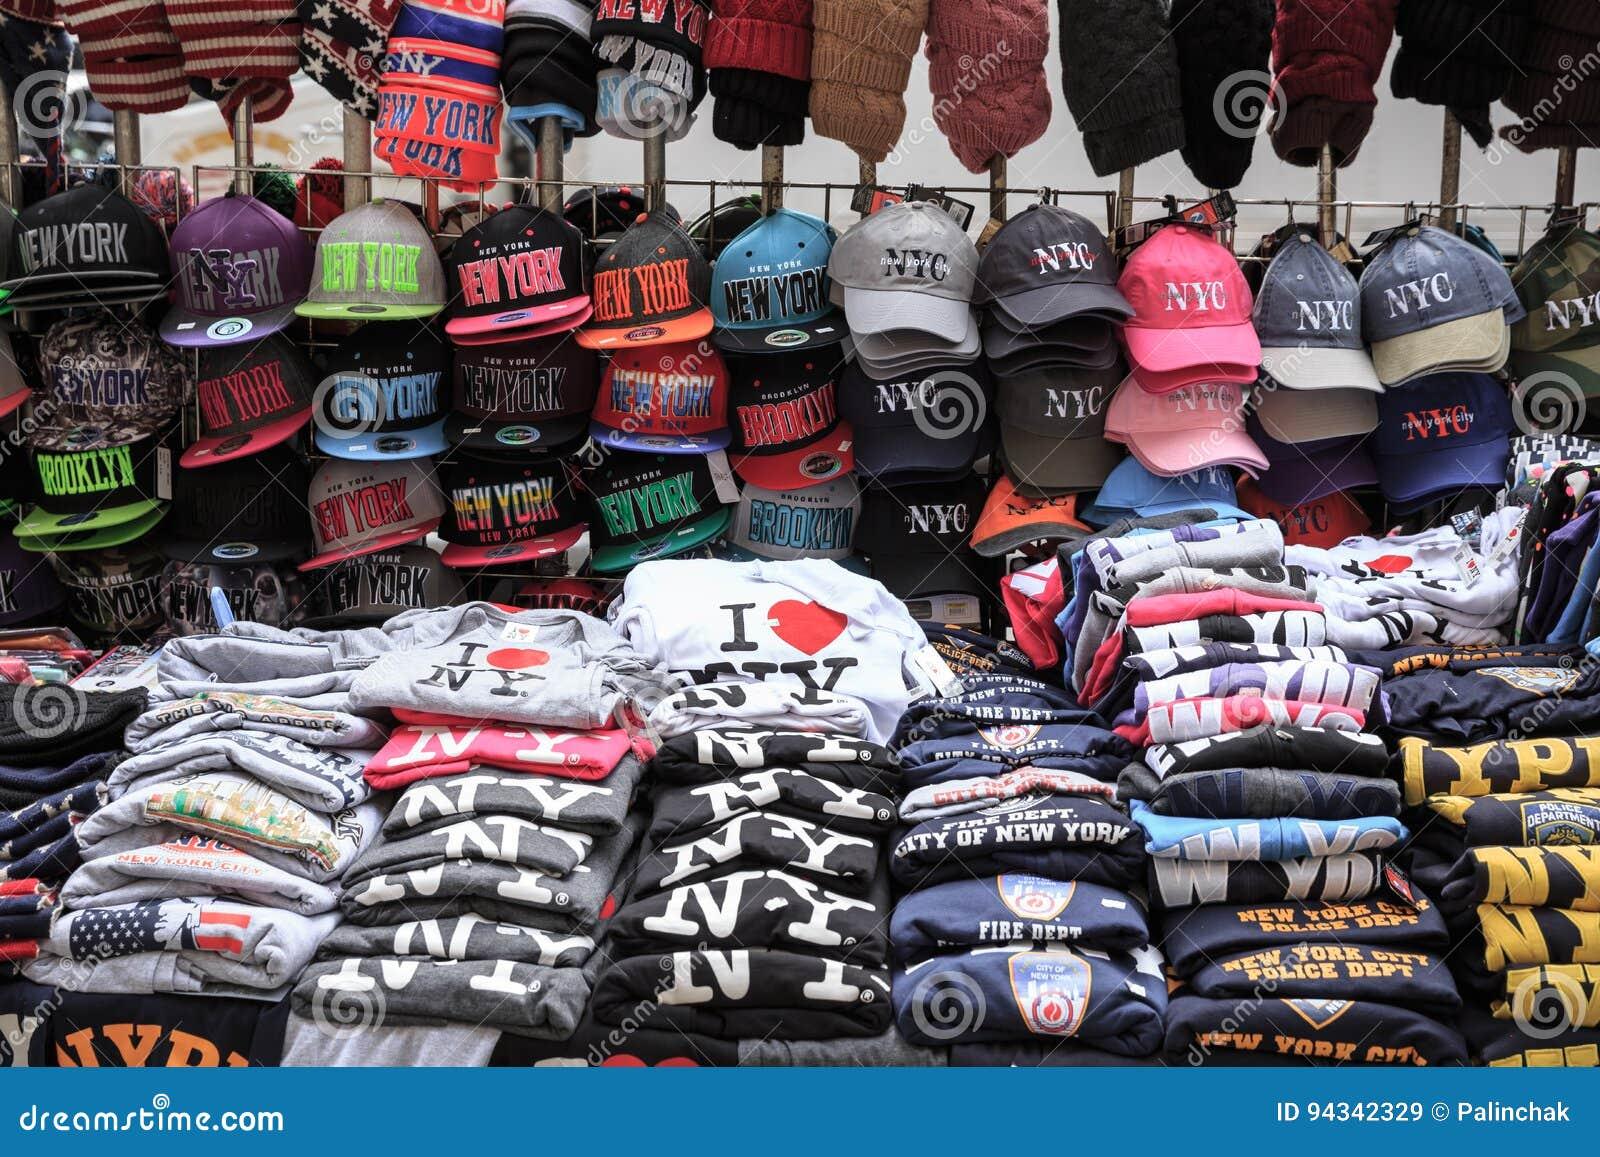 Street trade in New York City